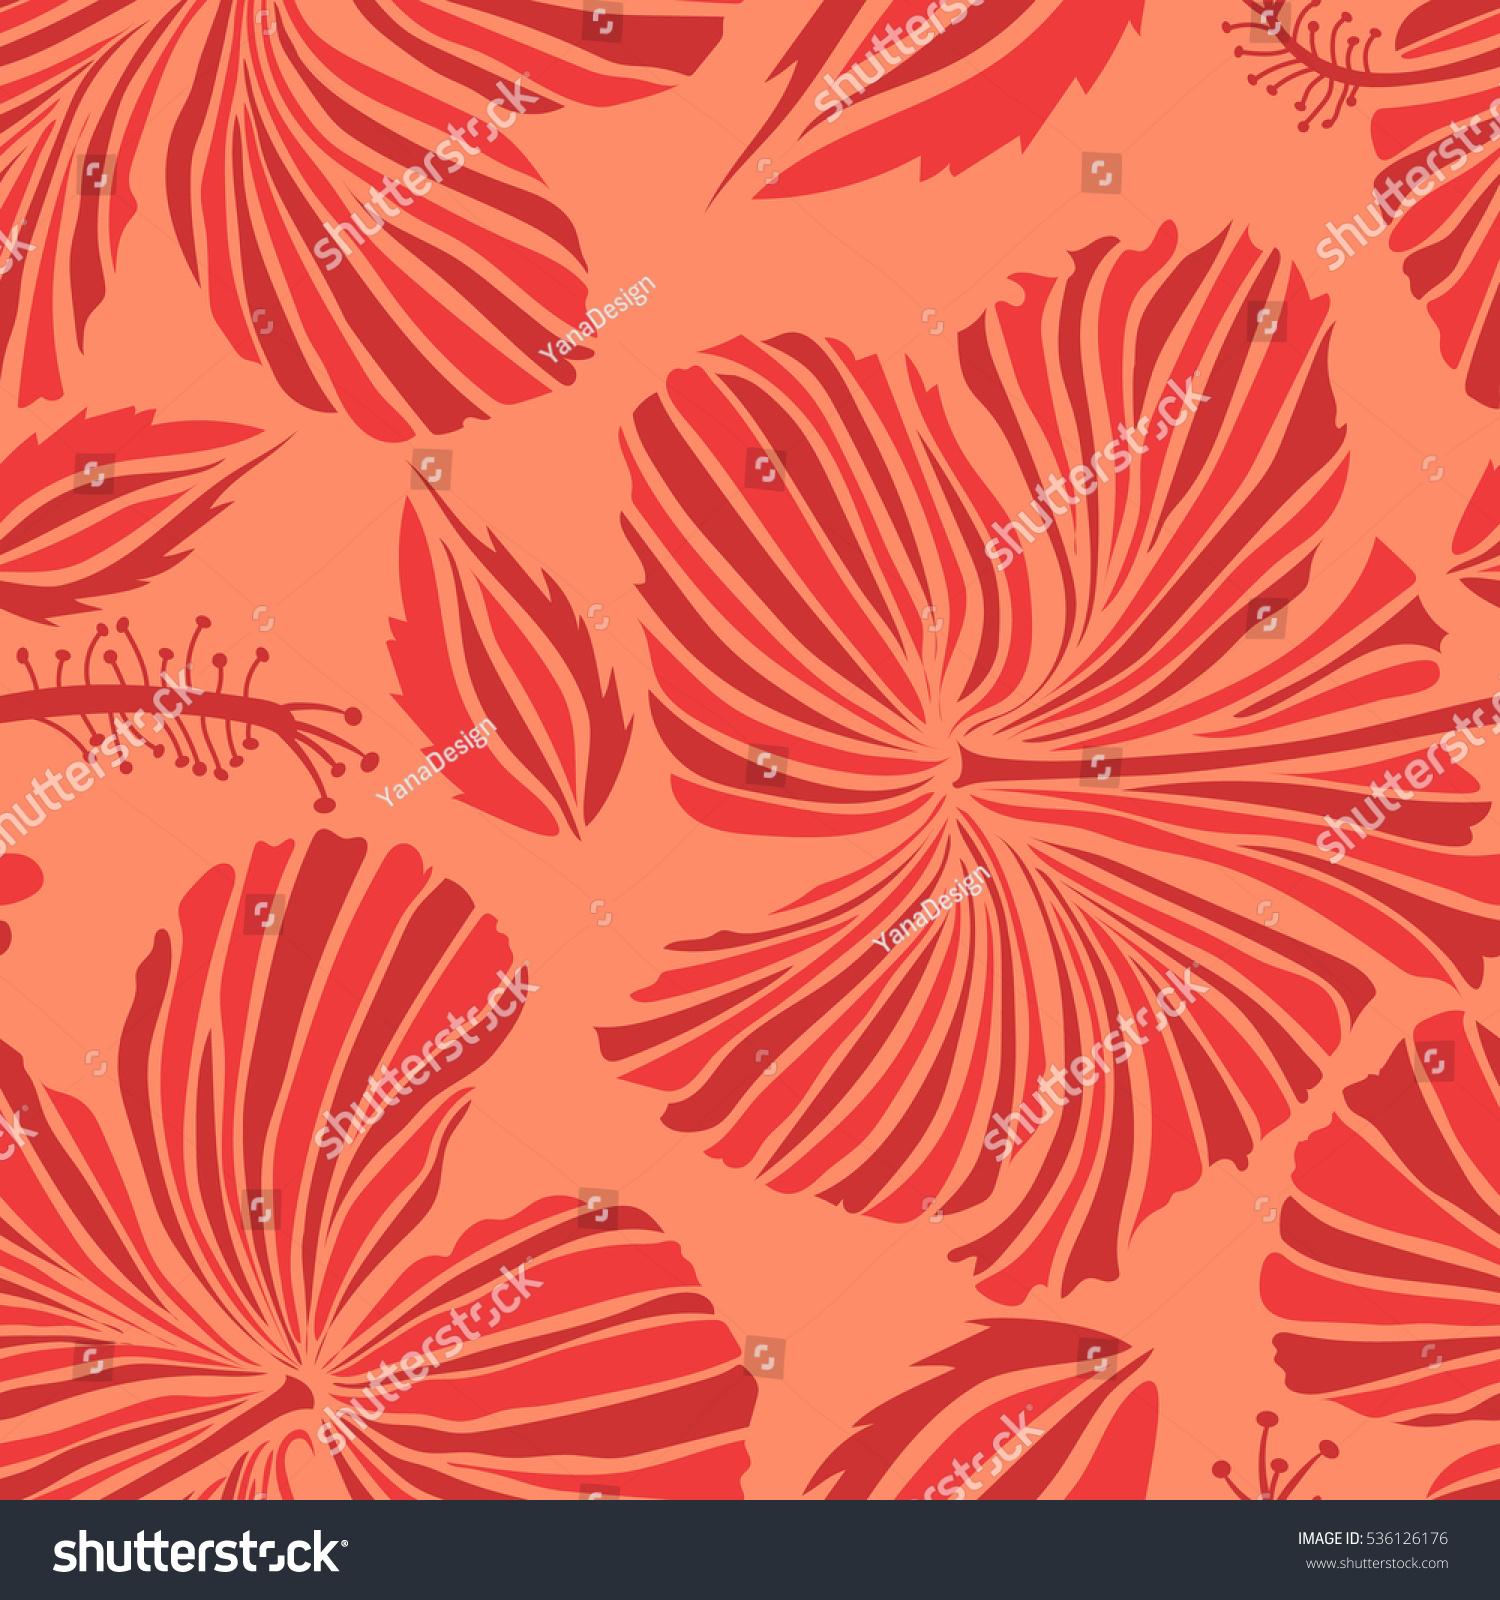 Design Orange Red Colors Invitation Wedding Stock Vector (Royalty ...